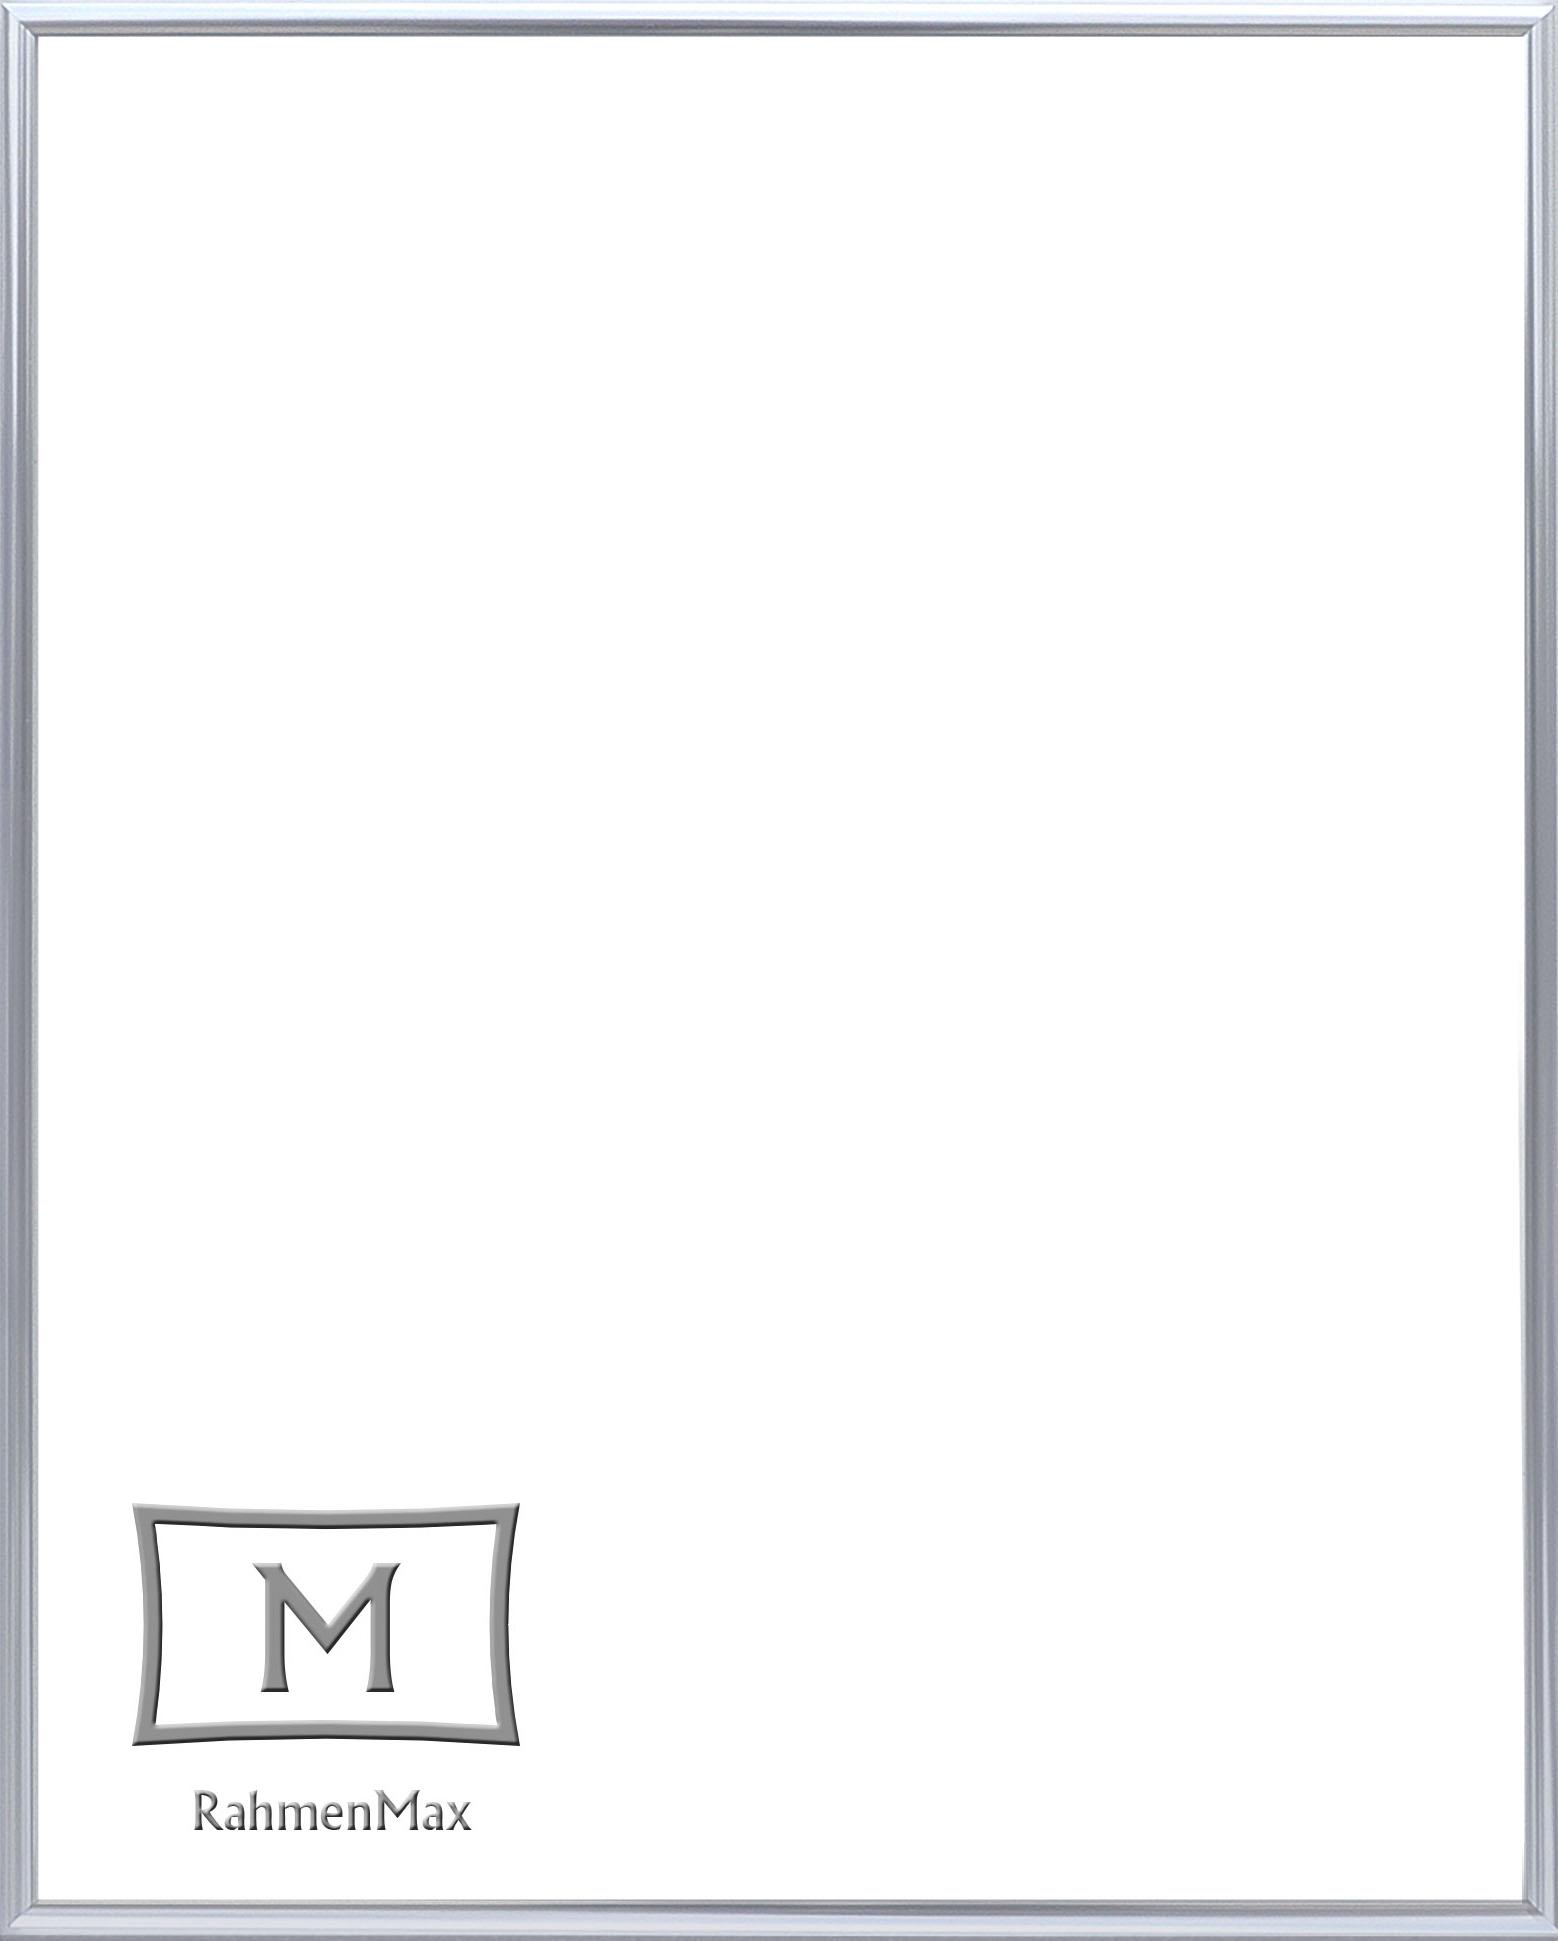 aluminium bilderrahmen qu bec farbw in din a4 21 x 29 7. Black Bedroom Furniture Sets. Home Design Ideas